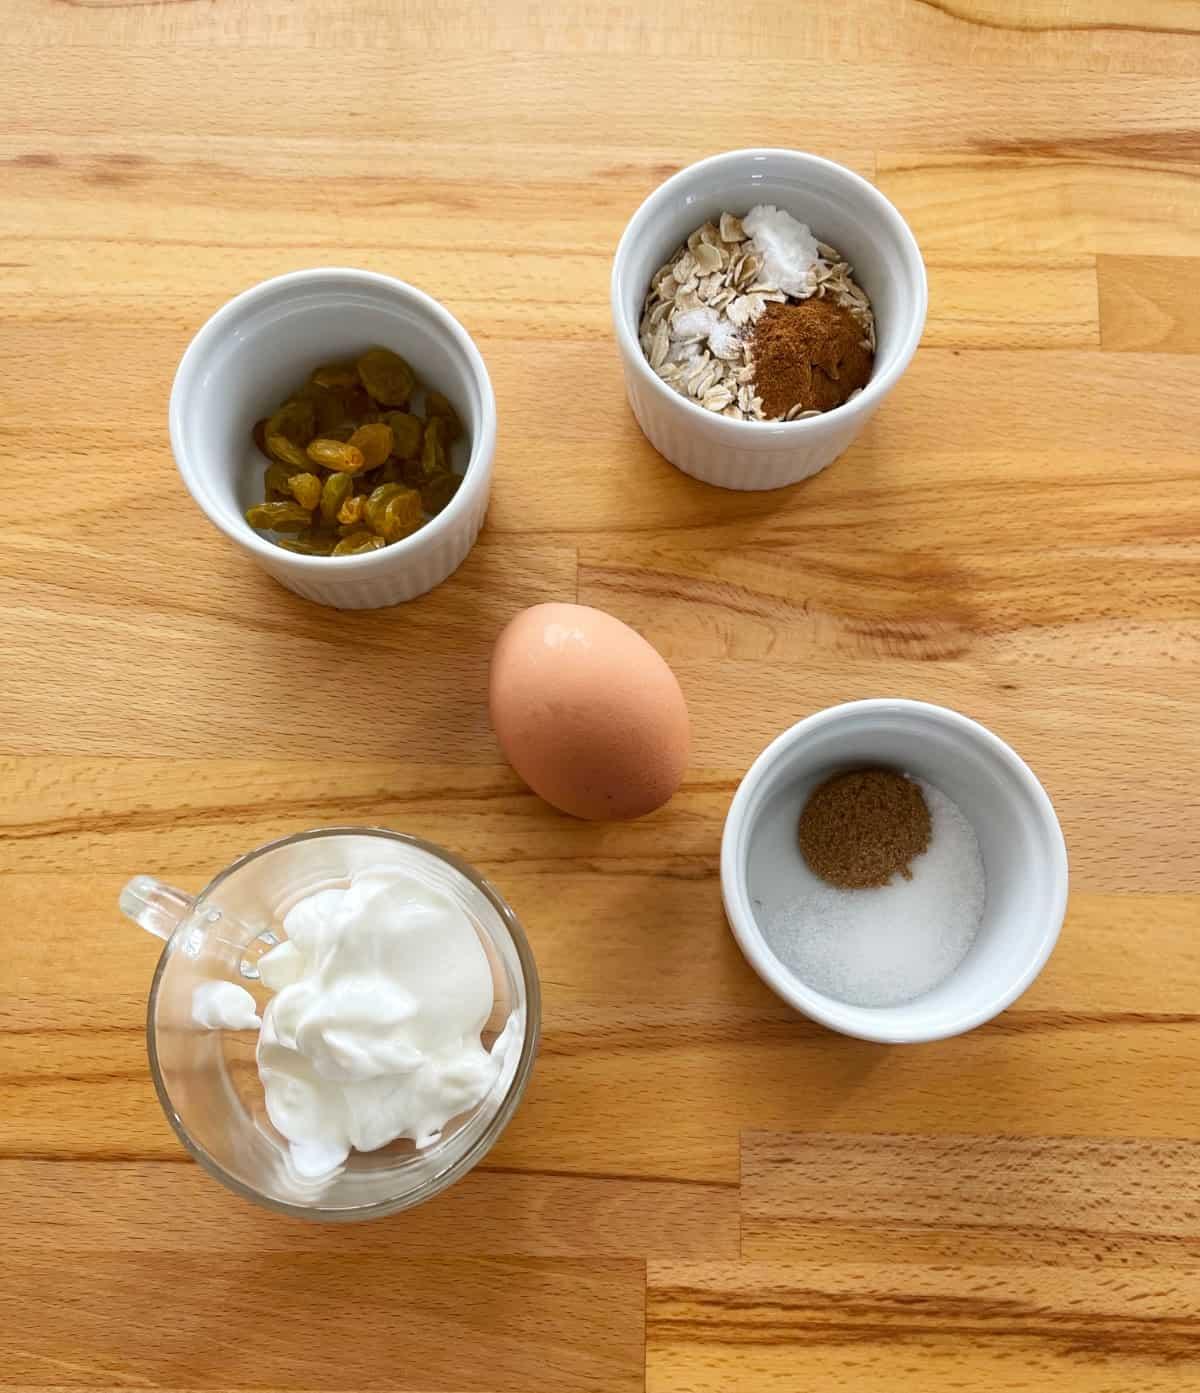 Ingredients for making microwave muffin including oats, cinnamon, raisins, egg, Greek yogurt and sugar an small white ramekins.